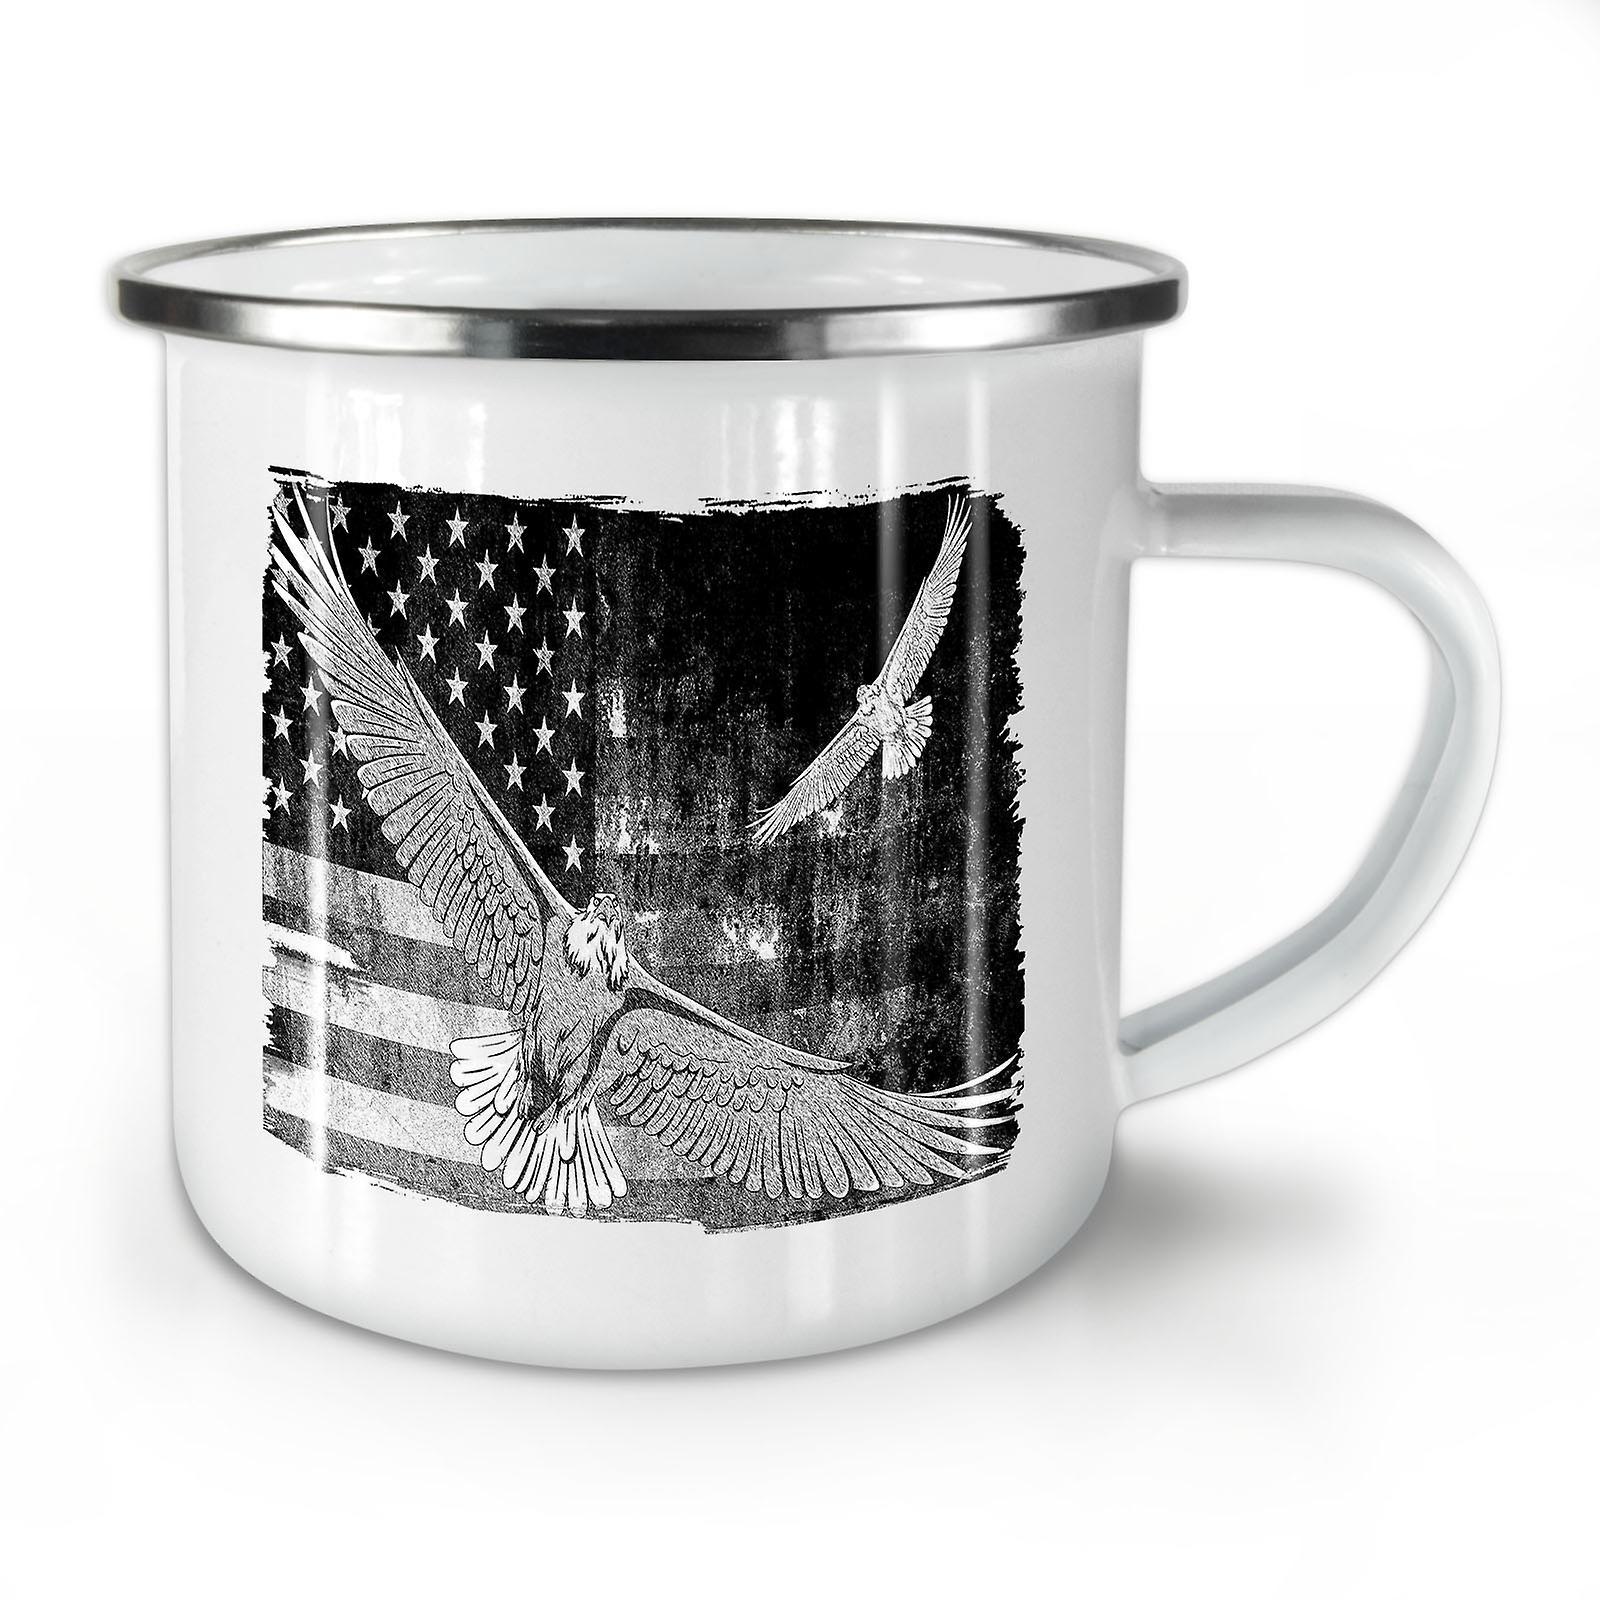 Whitetea Nouveau Usa Américain Drapeau Mug10 Café OzWellcoda Pays Émail XiTkZuOwP